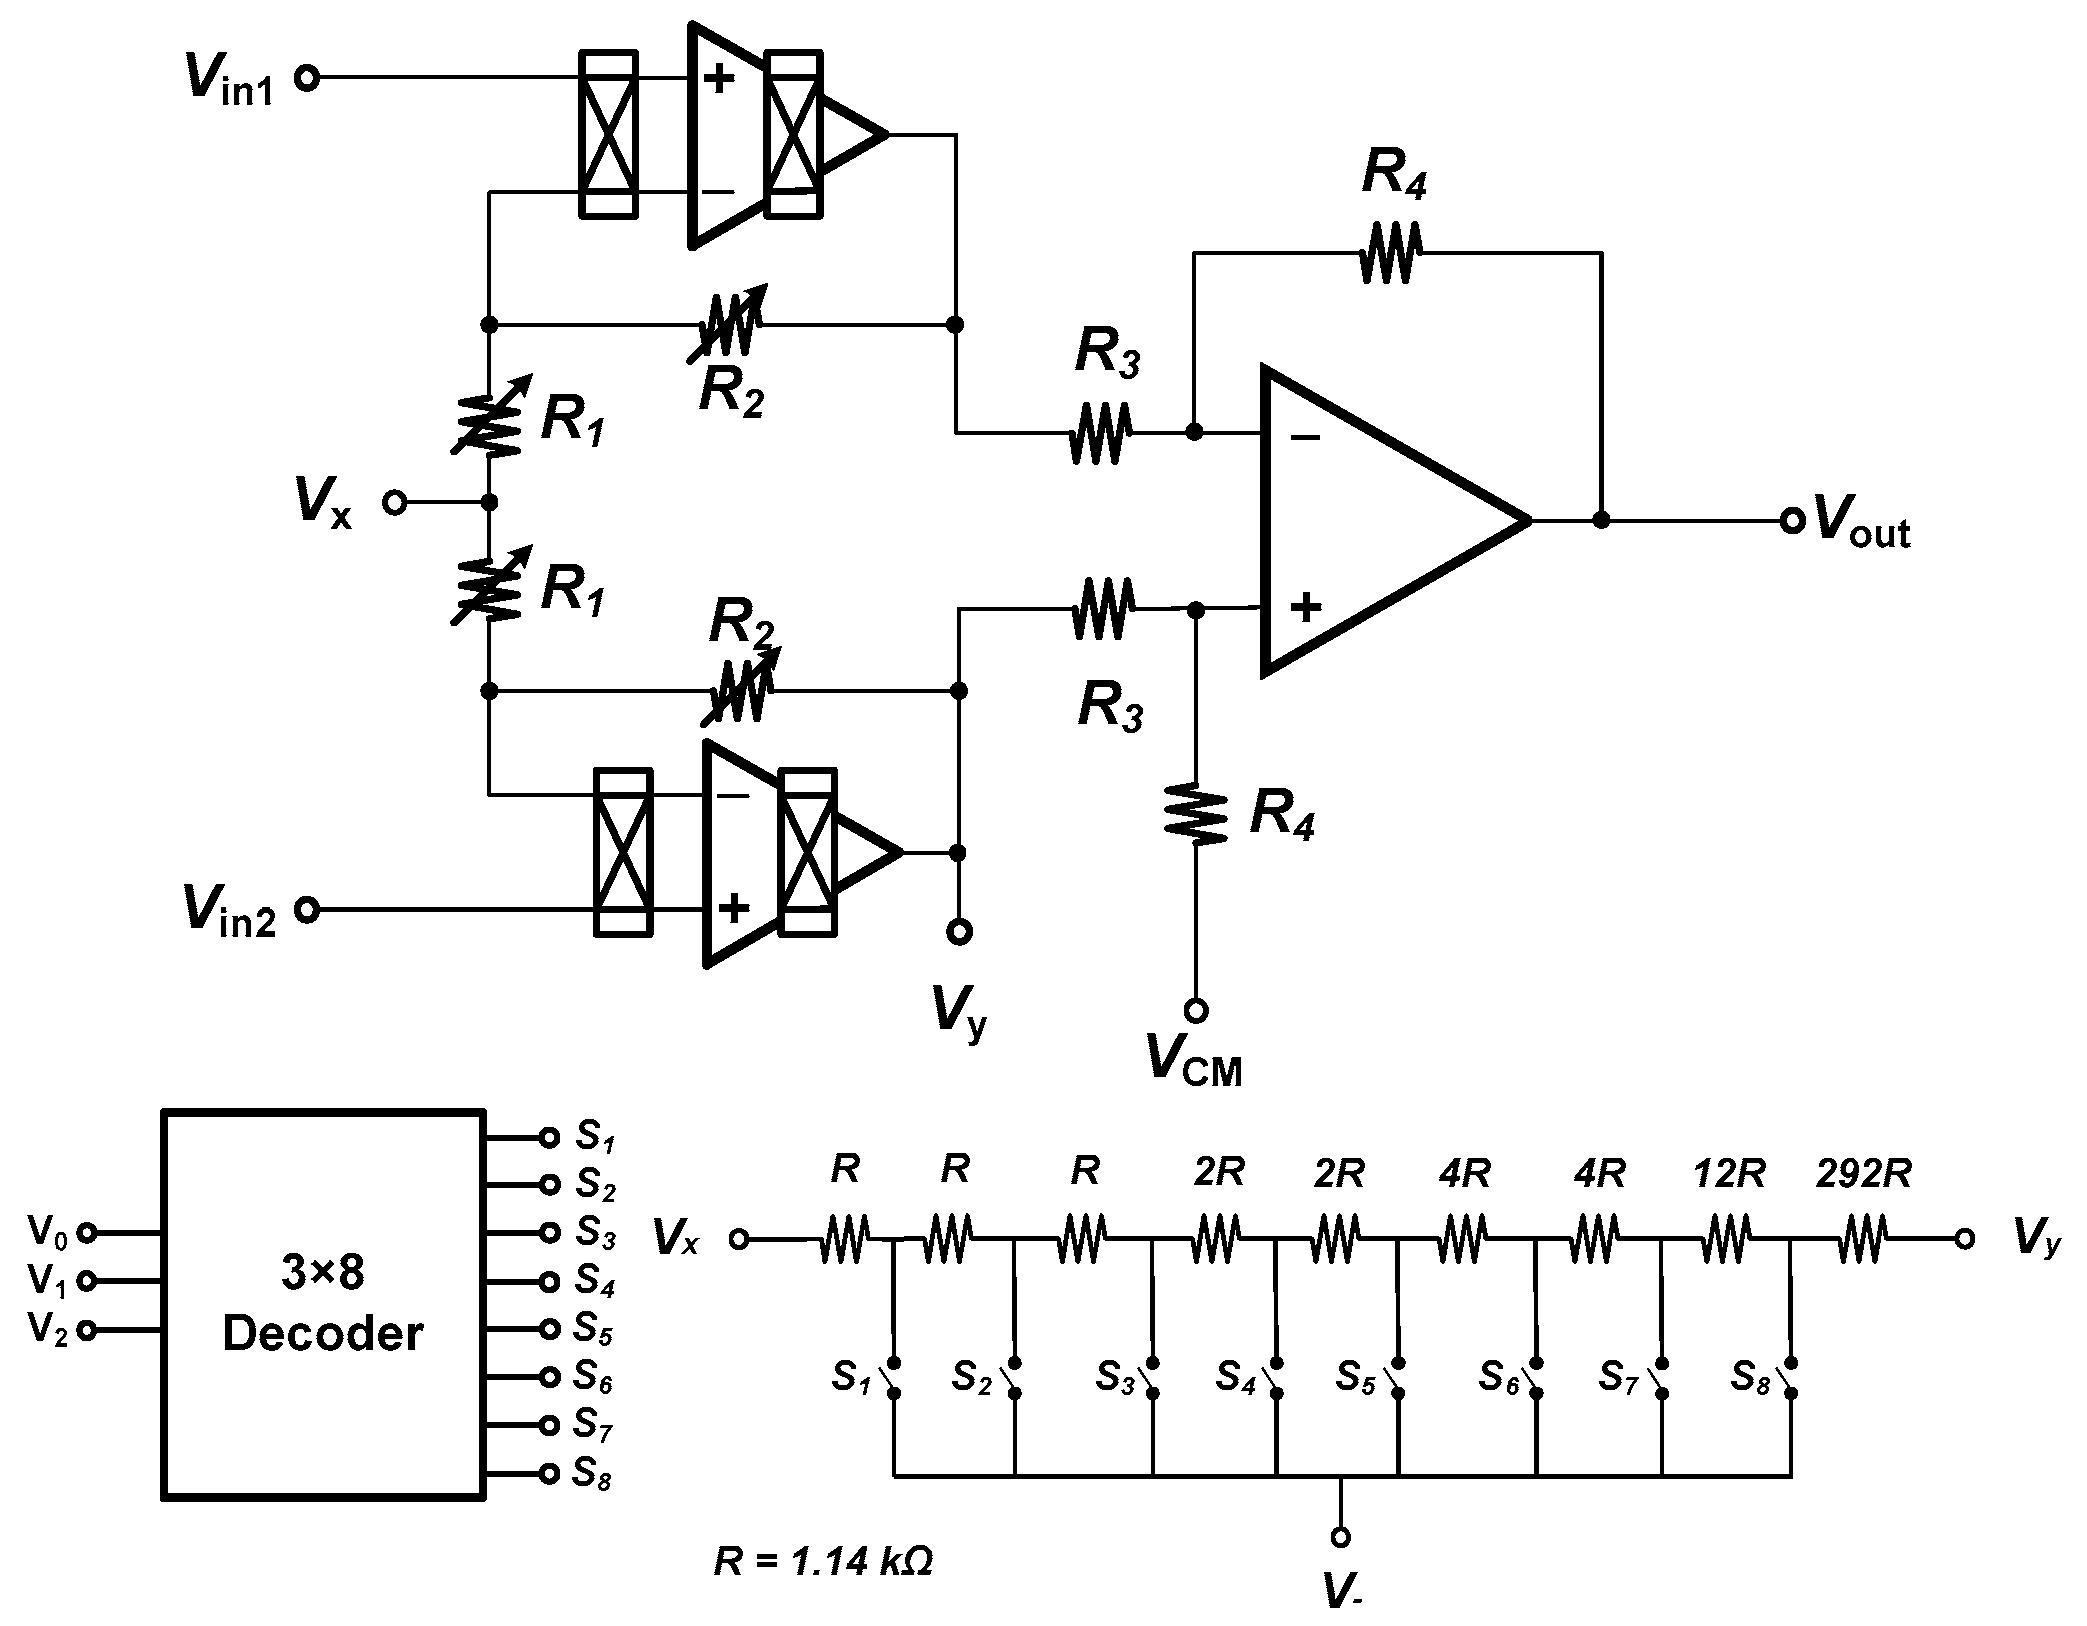 Micromachines Free Full Text Chopper Stabilized Instrumentation 3 8 Decoder Logic Diagram 09 00289 G002